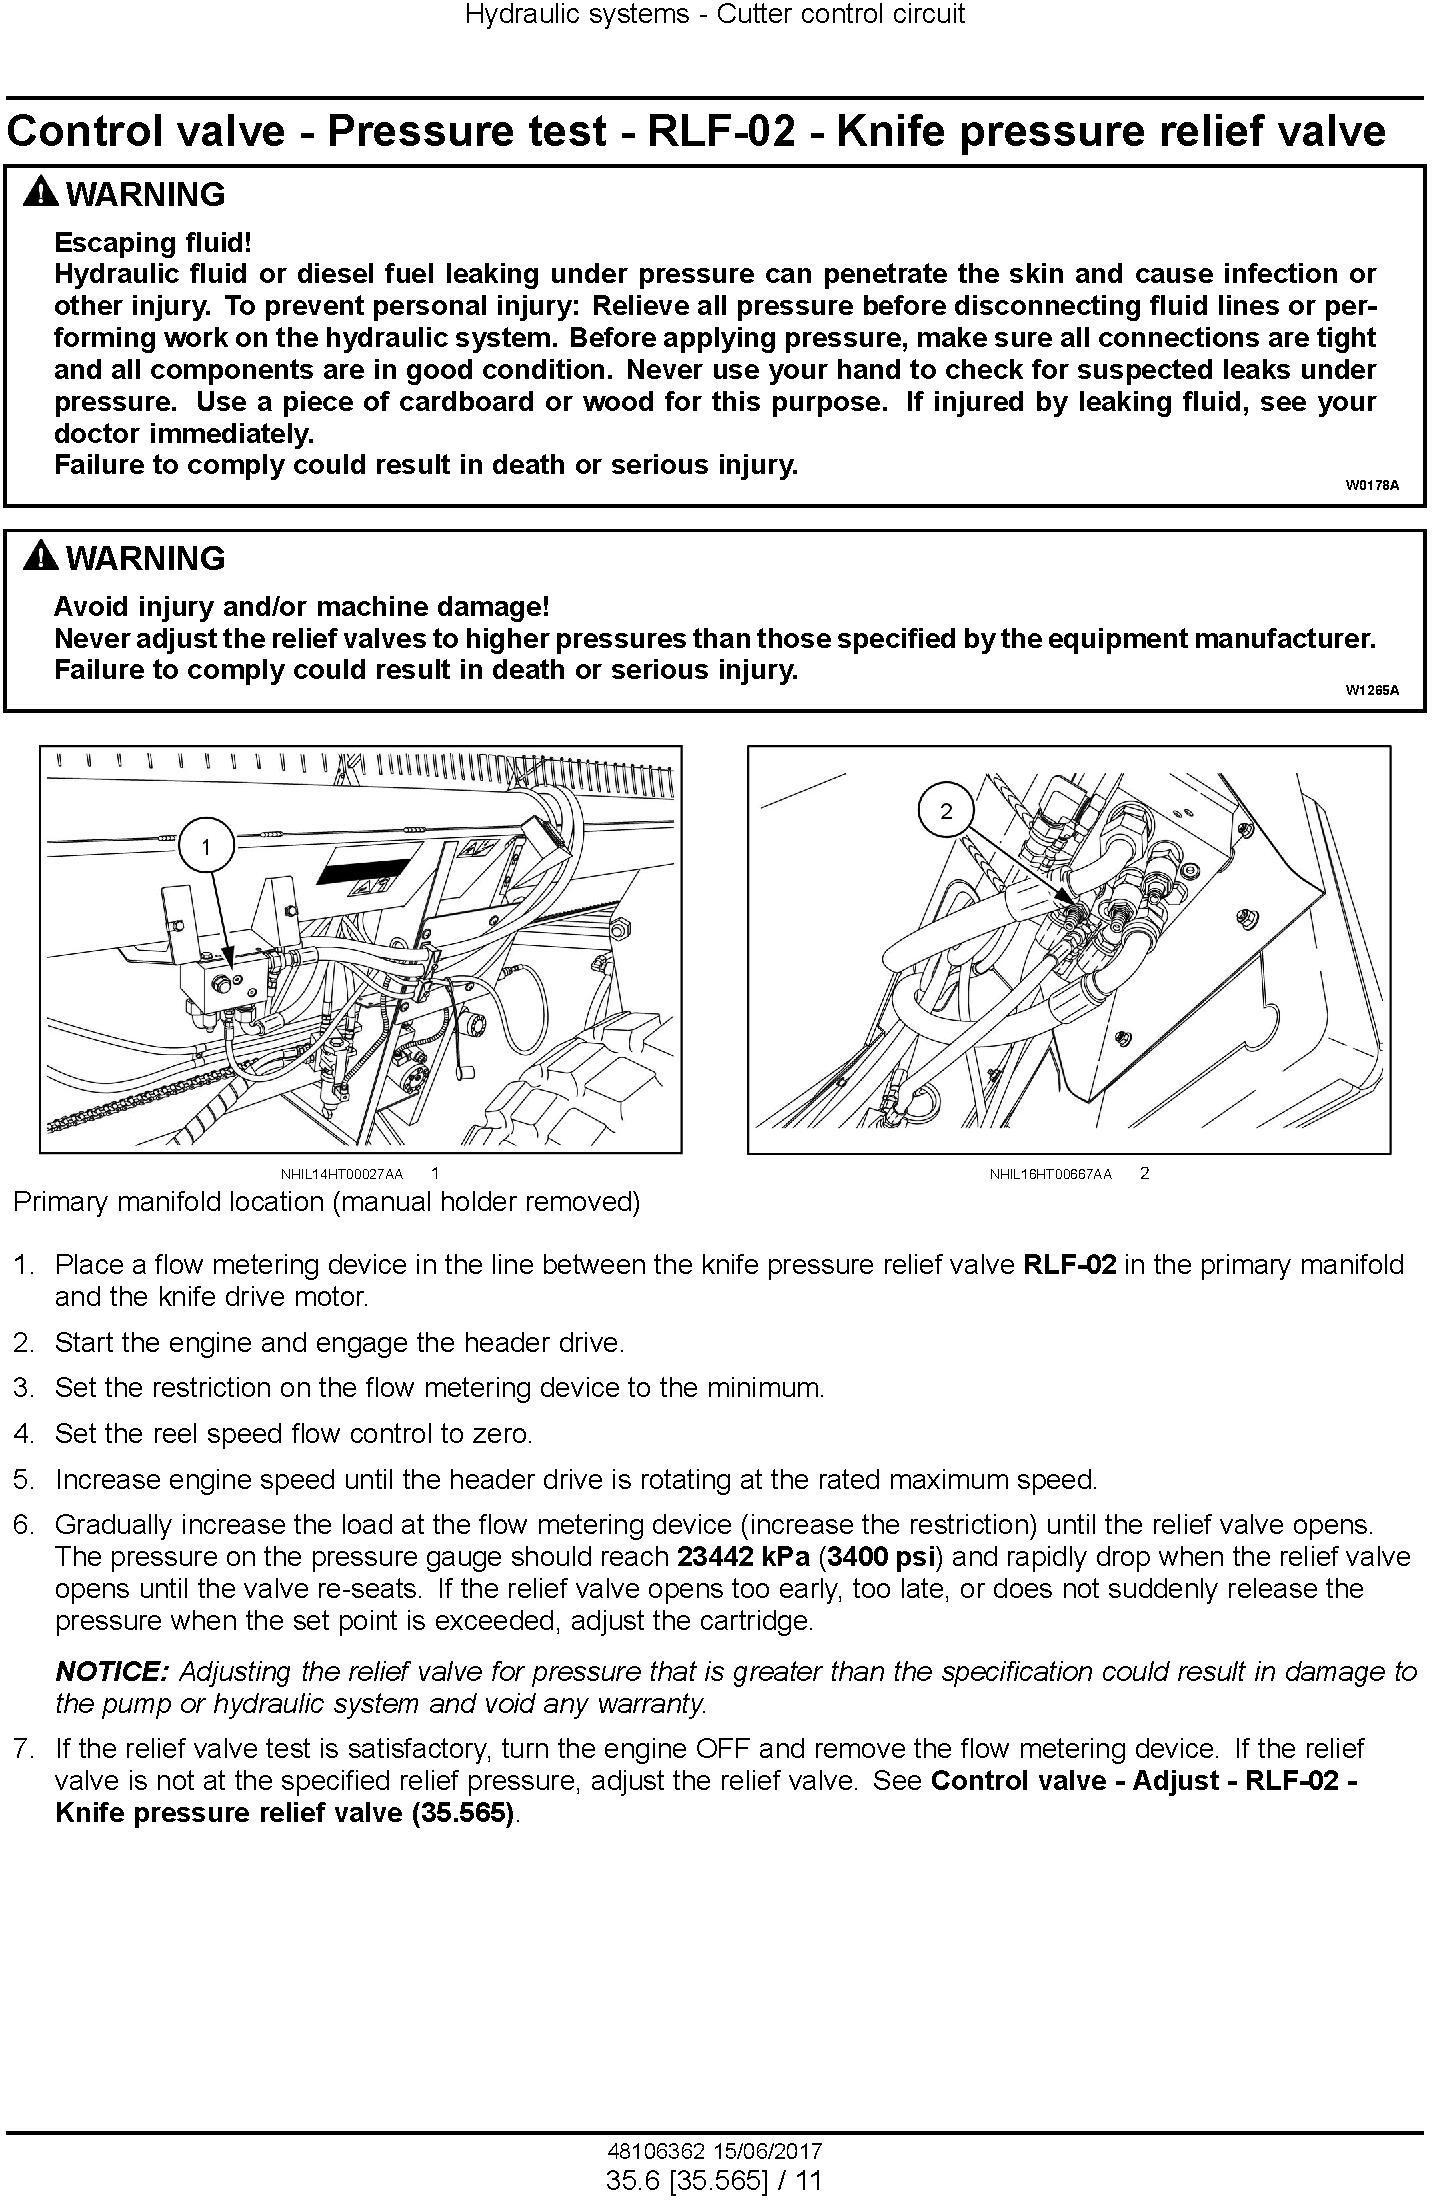 New Holland DuraSwath 421HB, 425HB, 430HB, 436HB, 440HB Draper Headers Service Manual - 3